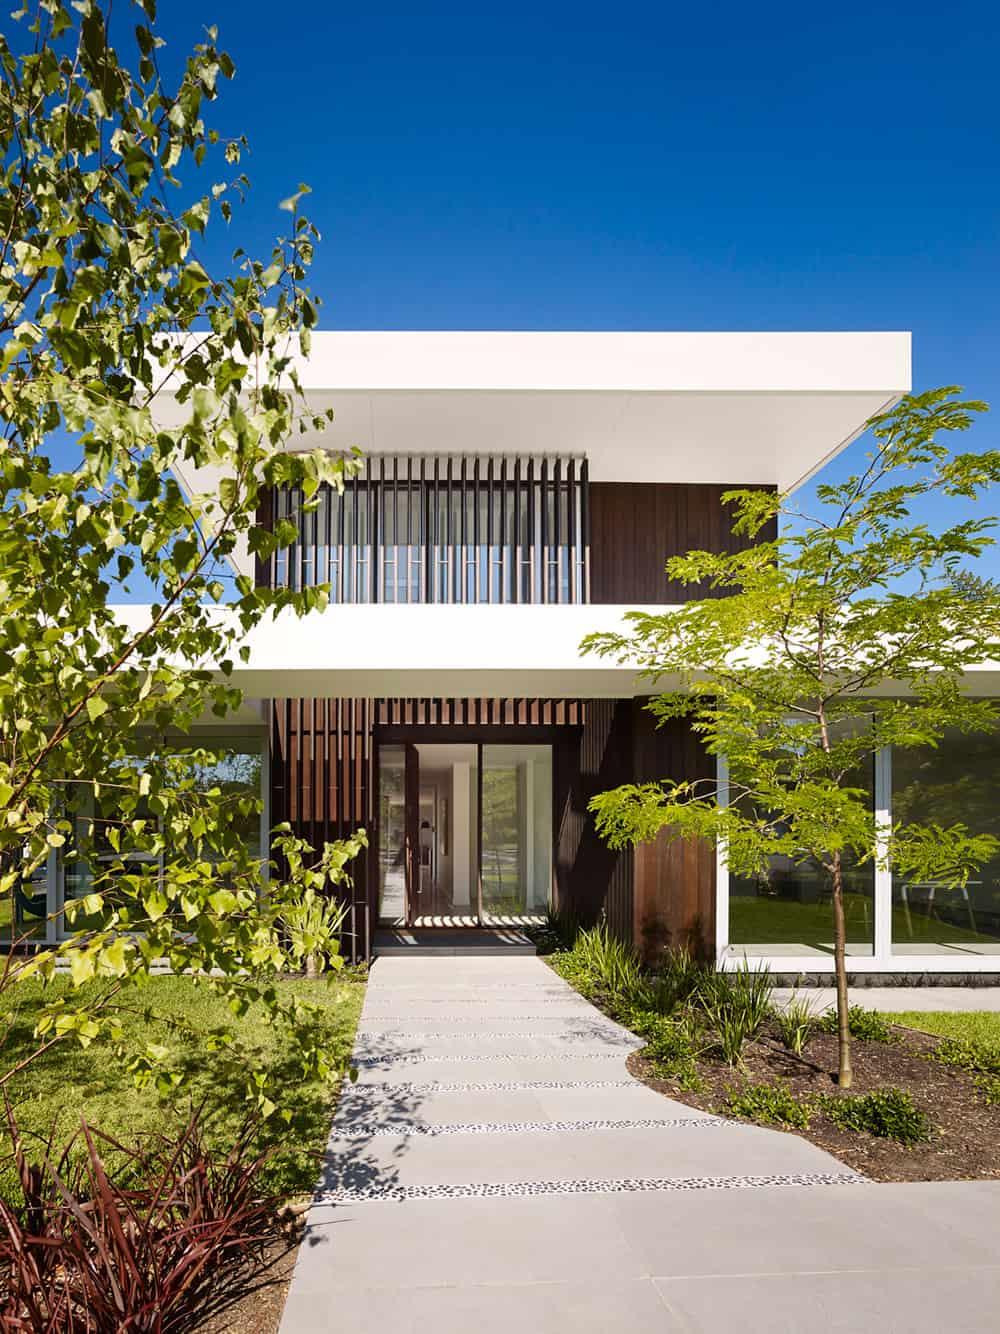 California House By Inform Design U0026 Pleysier Perkins (1